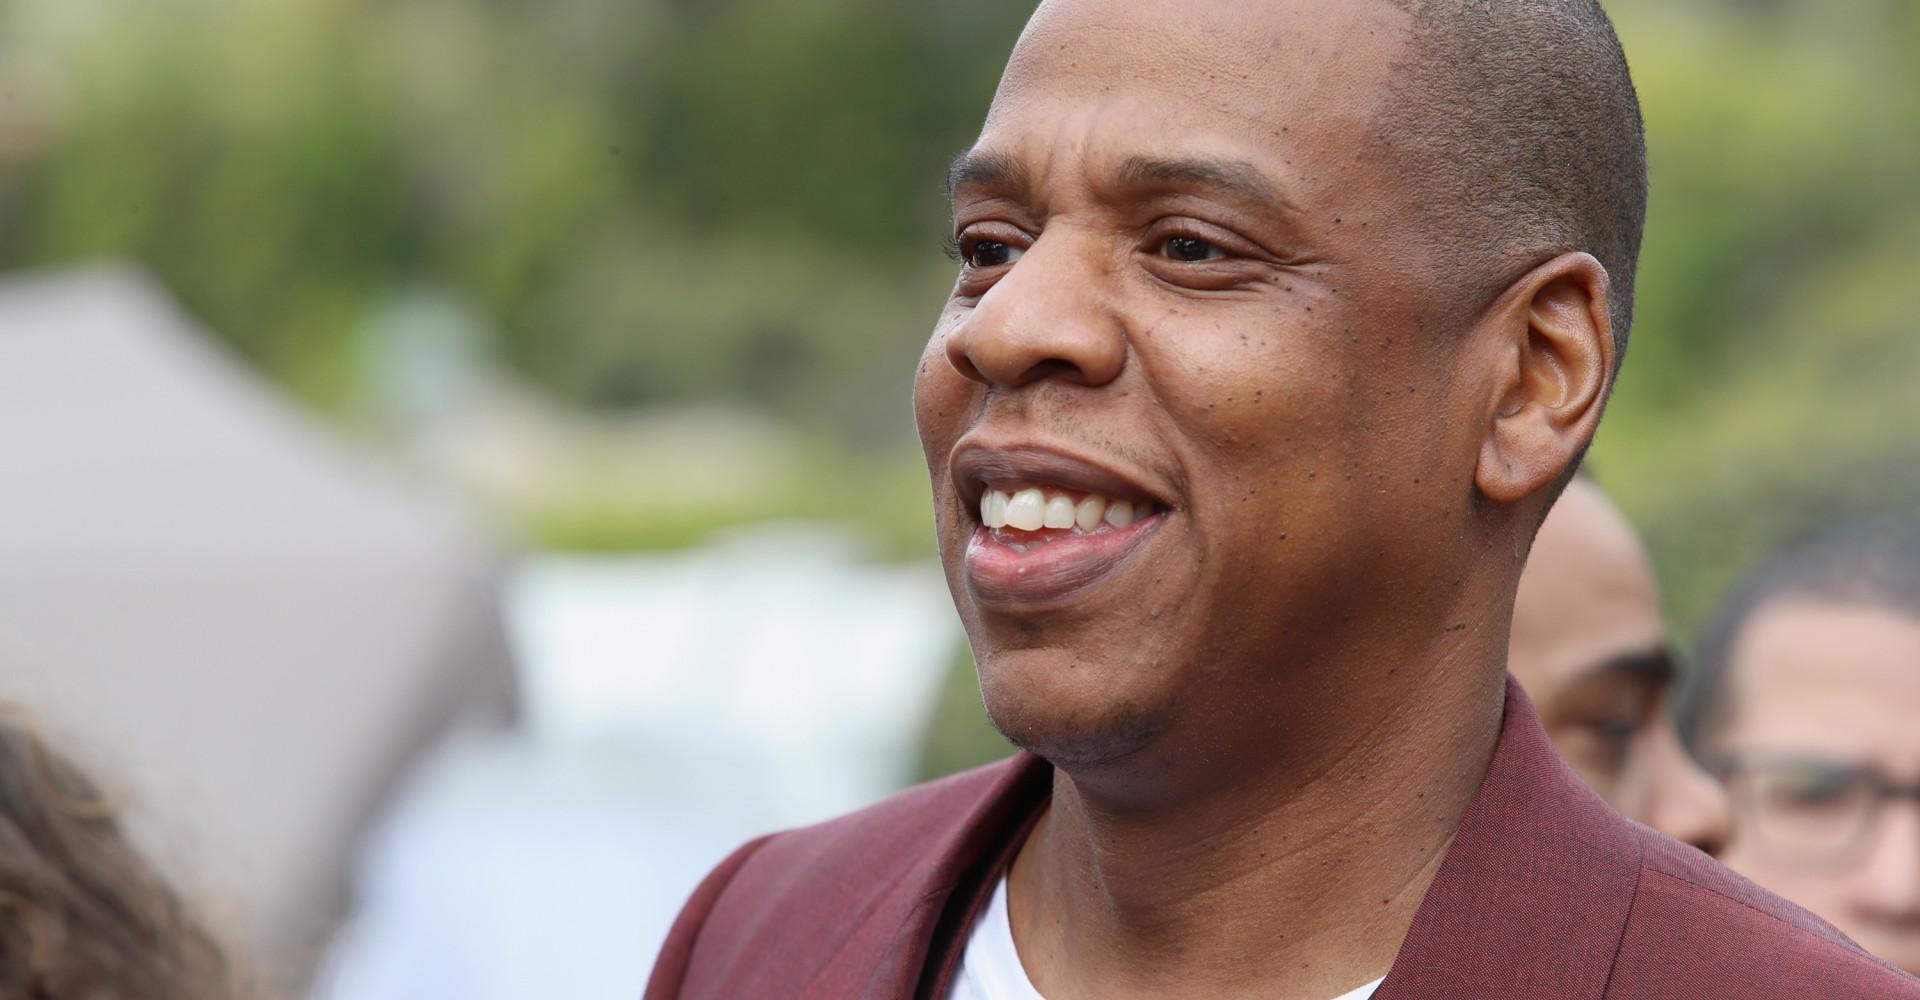 Jay-Z nommé président des opérations basketball chez Puma